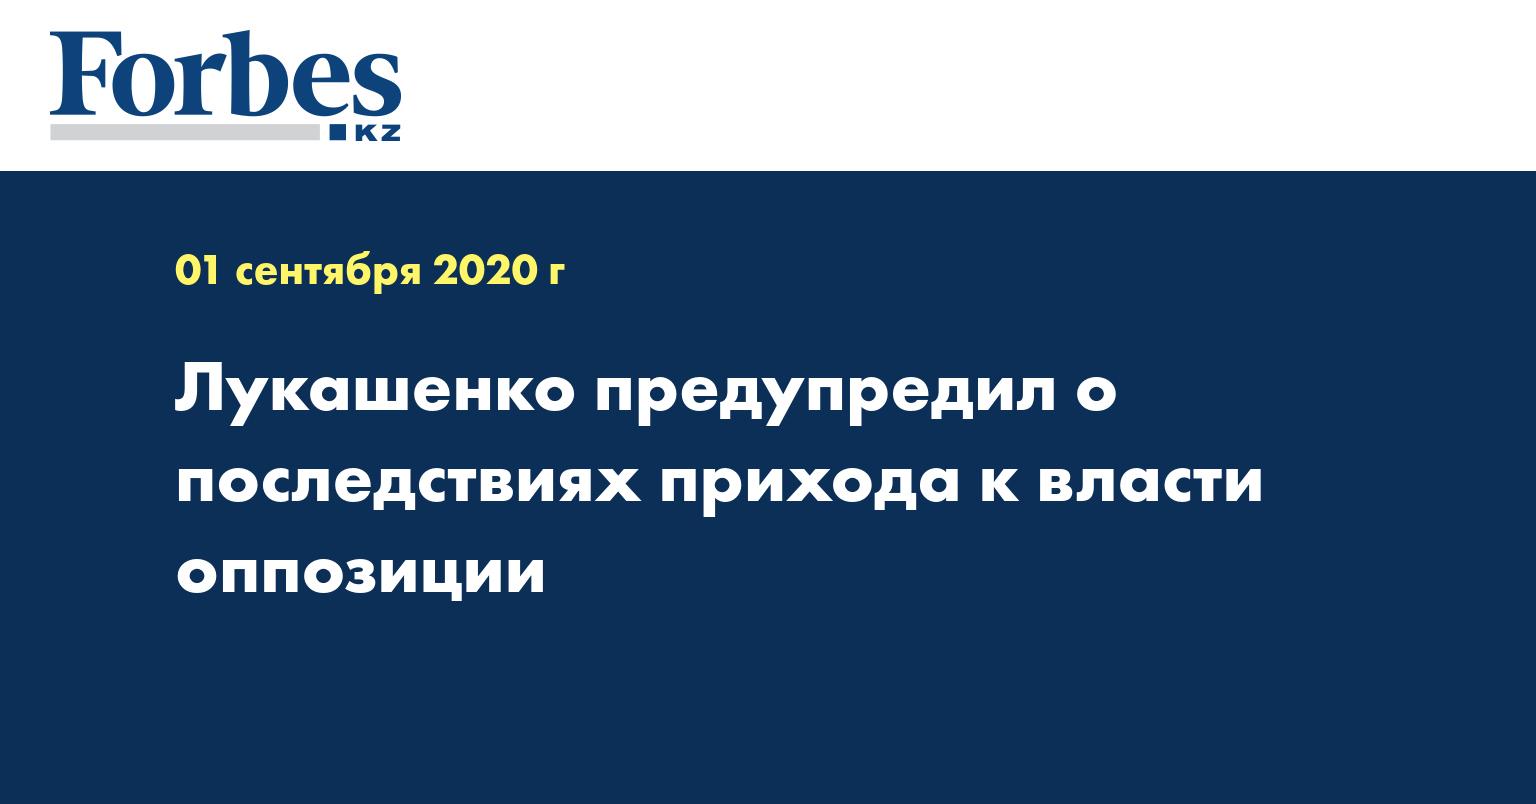 Лукашенко предупредил о последствиях прихода к власти оппозиции